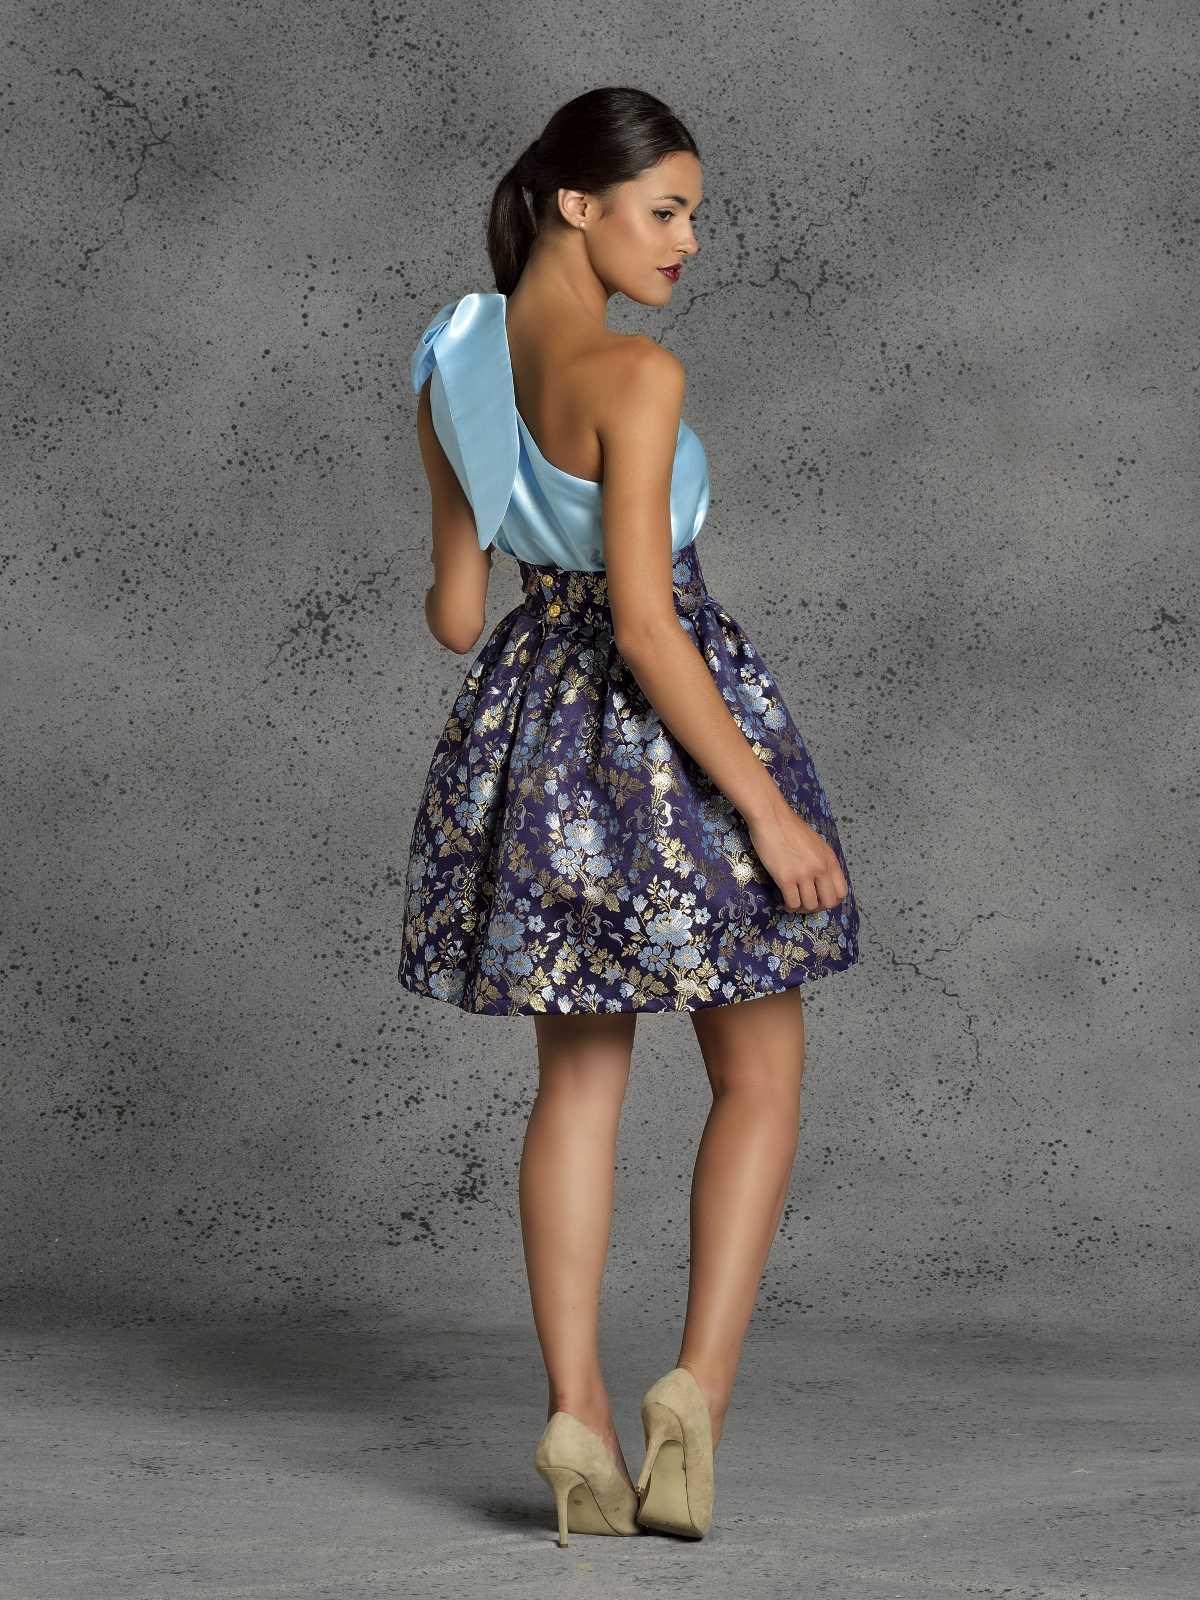 falda corta de fiesta morada para fiesta